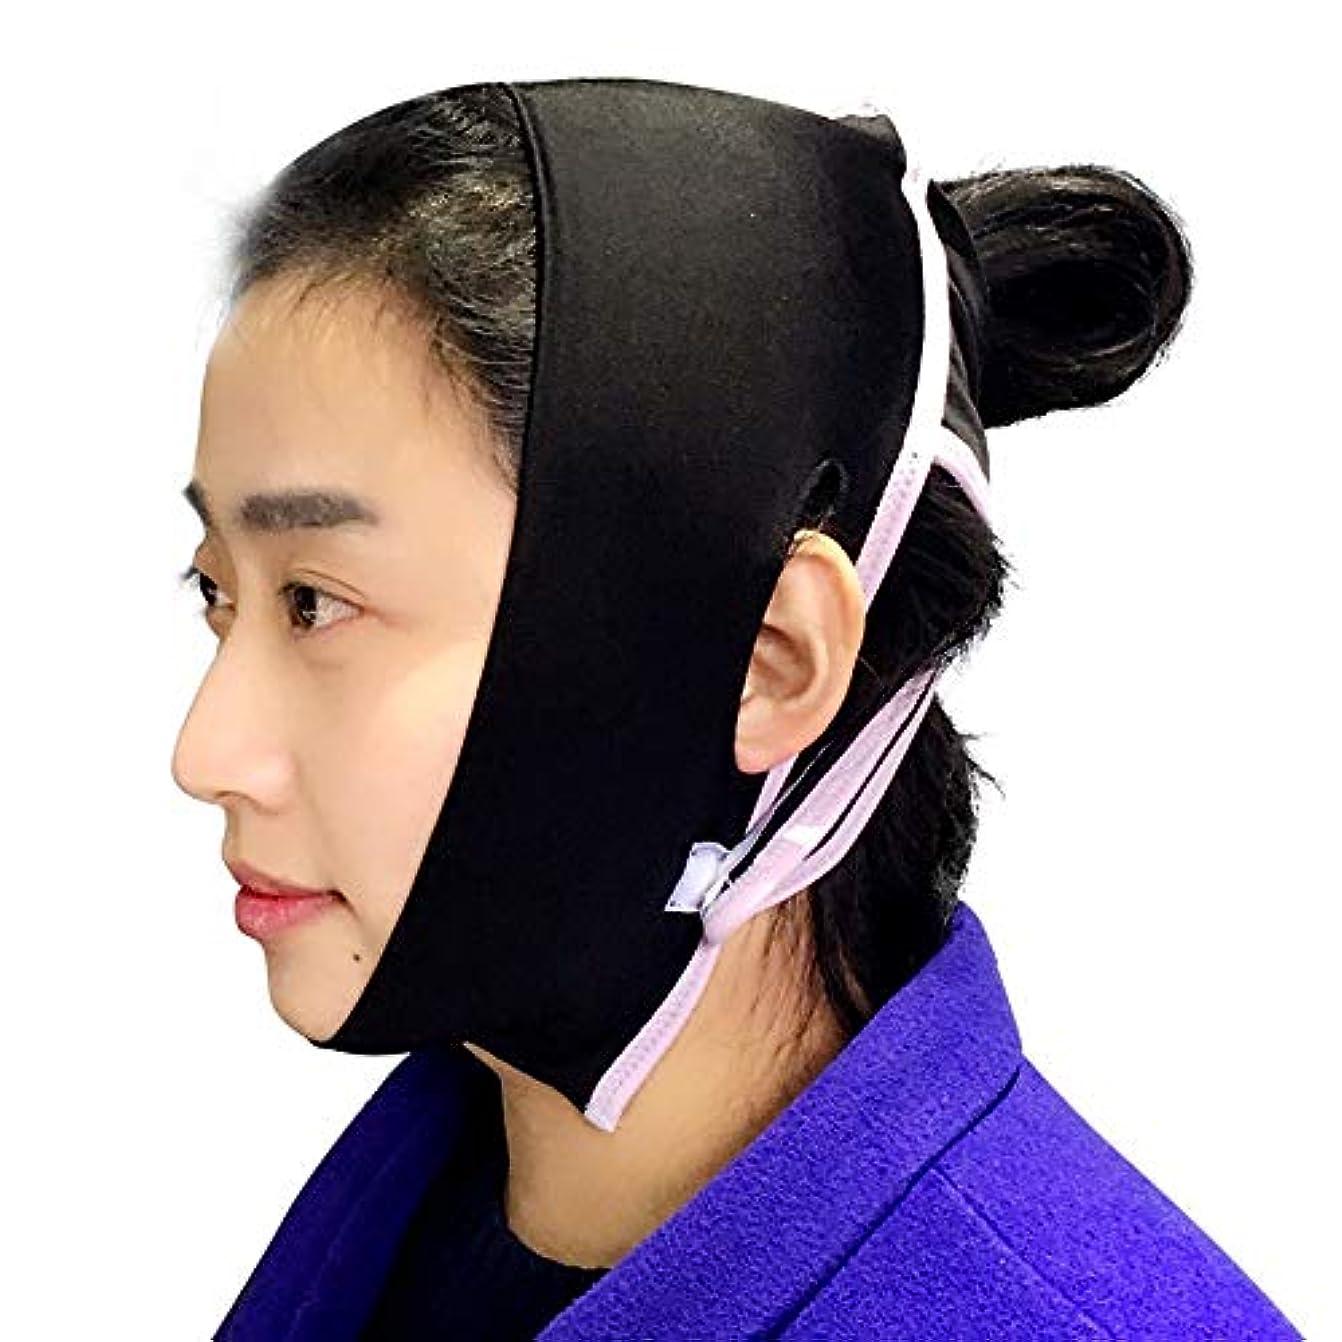 XHLMRMJ フェイスリフトマスク、小さなVフェイス睡眠包帯マスクシンダブルチンリフト引き締め肌